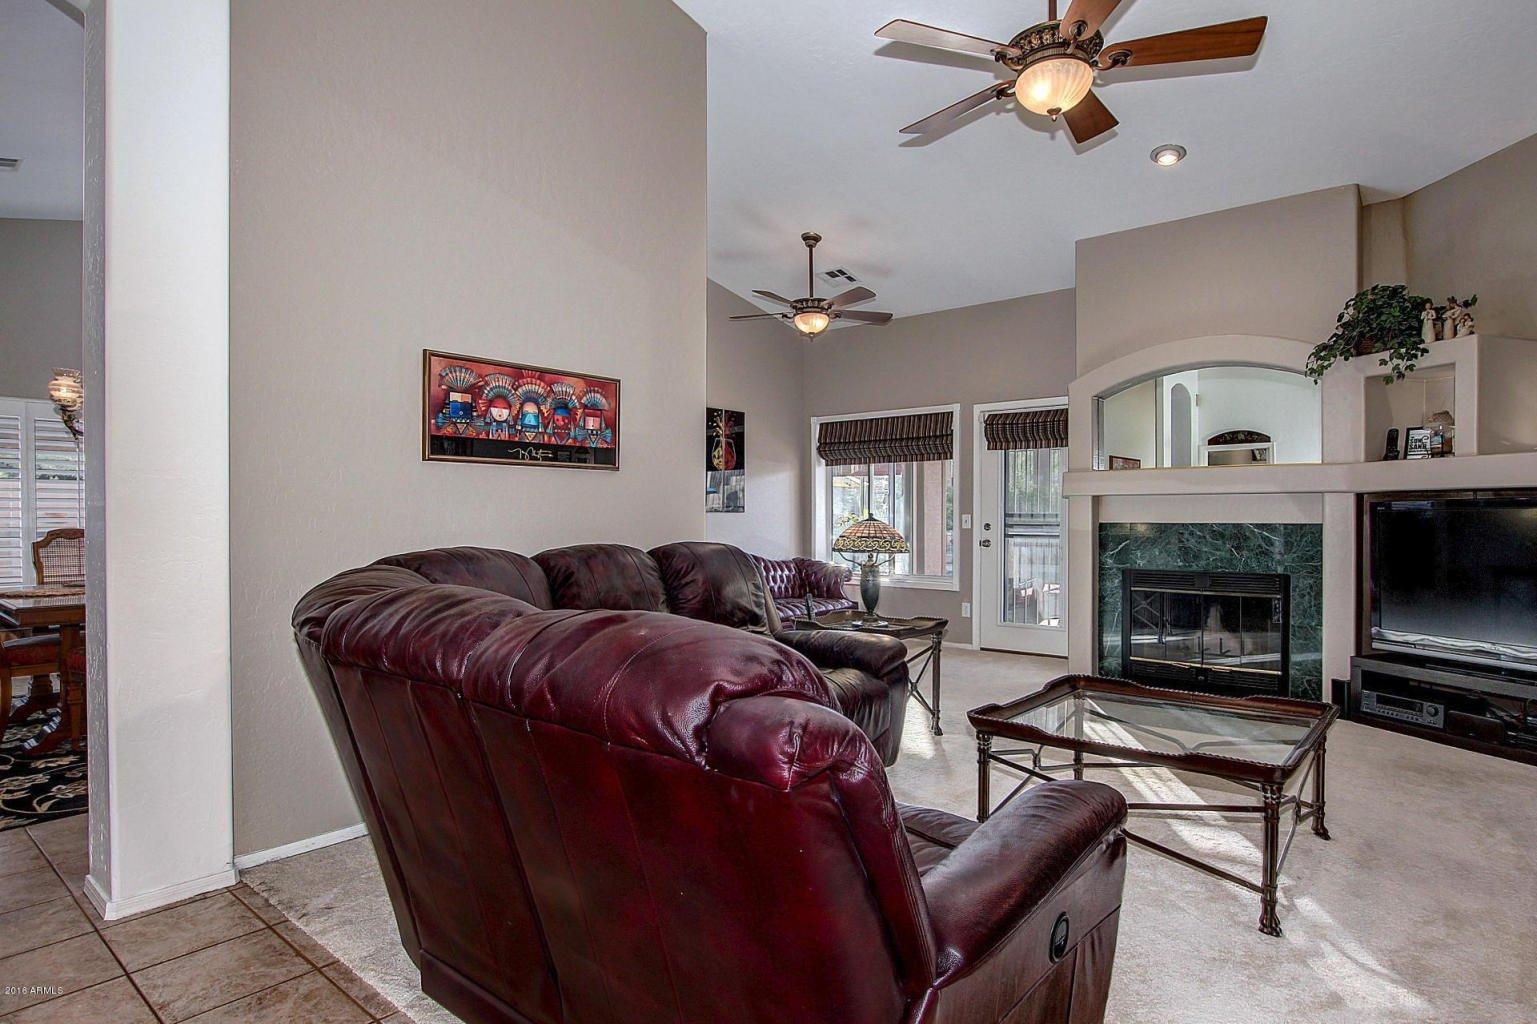 Photo 5: Photos: 3602 E Mountain Sky Avenue in Phoenix: Ahwatukee House for sale : MLS®# 5462780